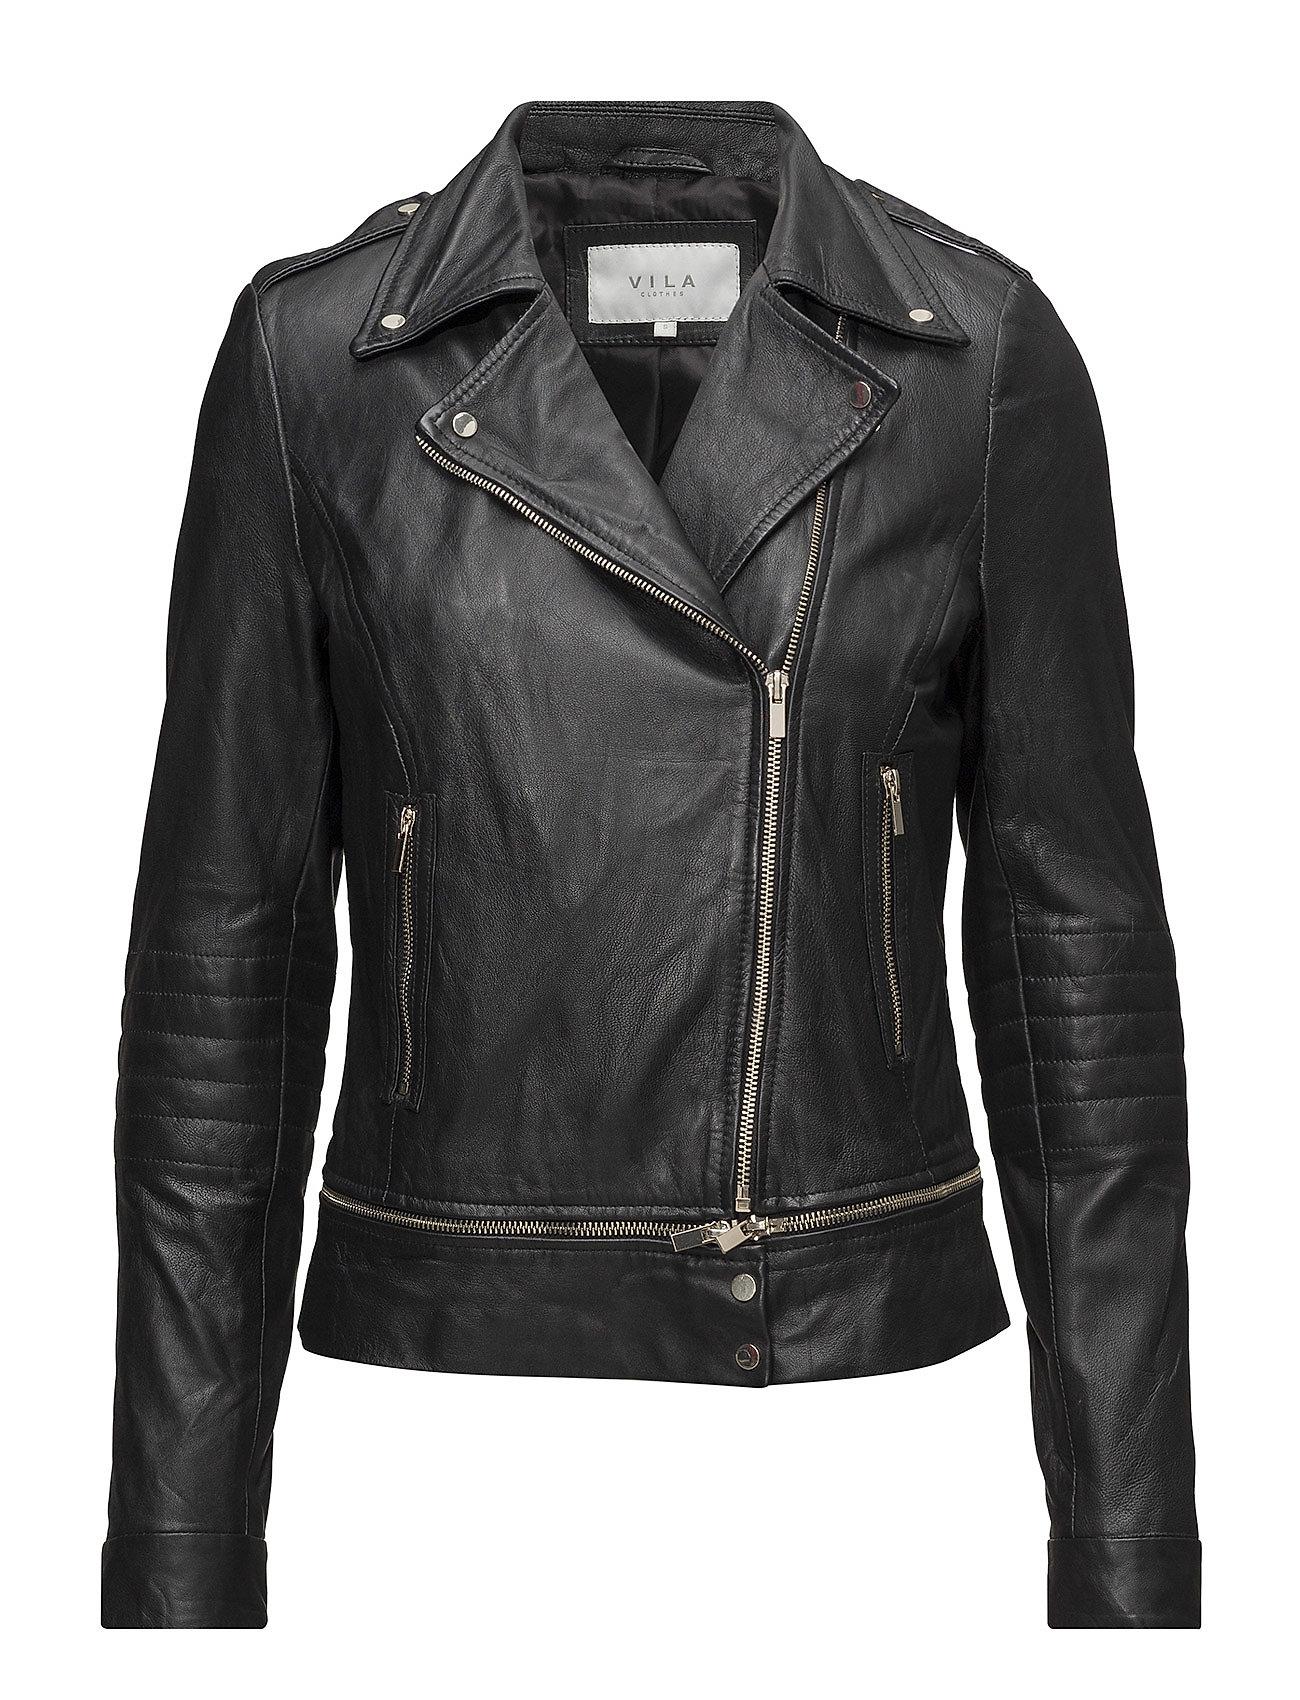 Vila leather jacket